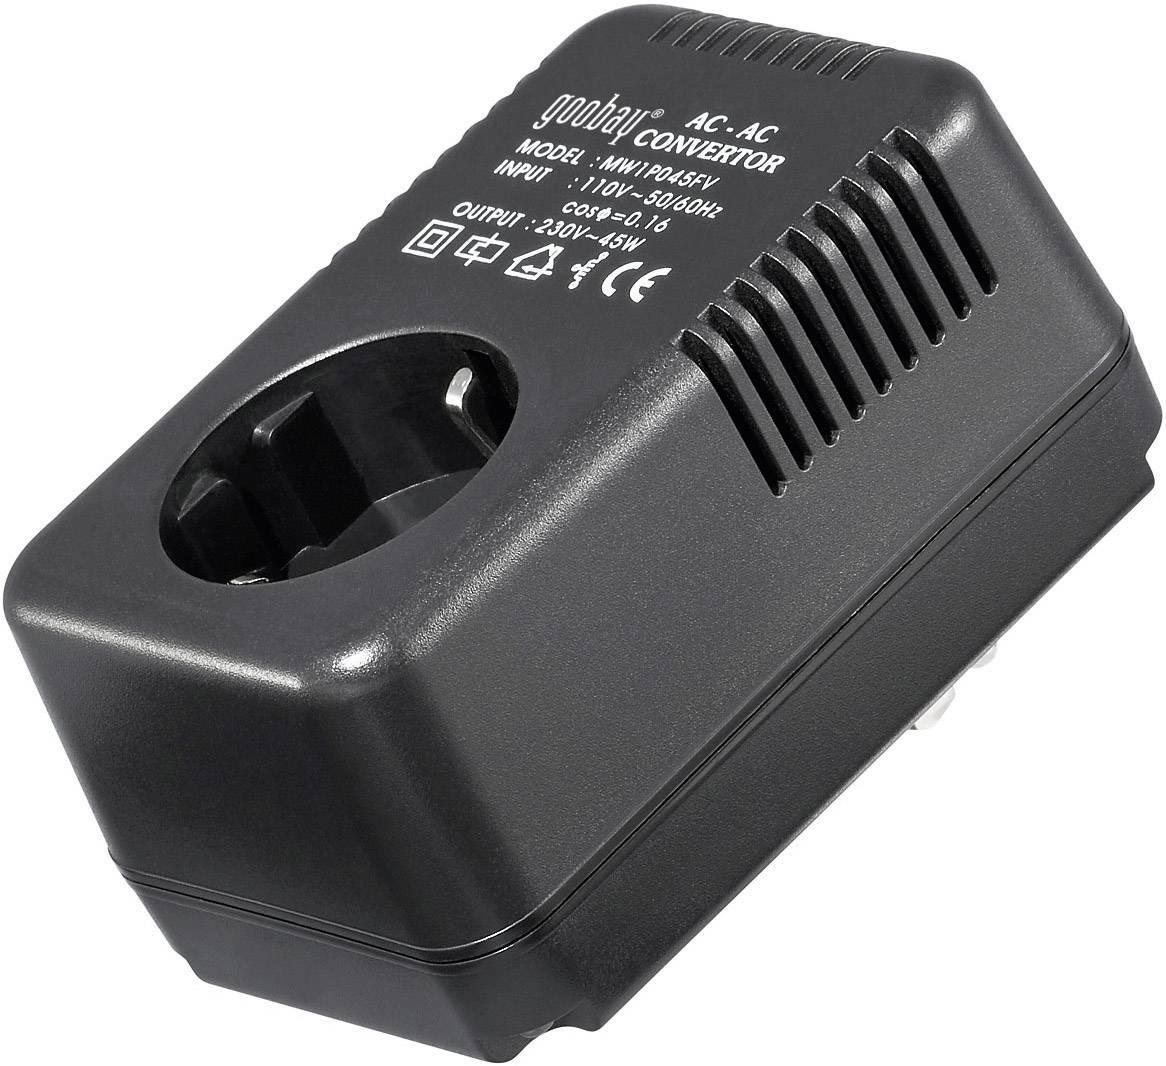 Měnič napětí Goobay SPW MW 1P045FV, AC/AC 110 -> 230 V